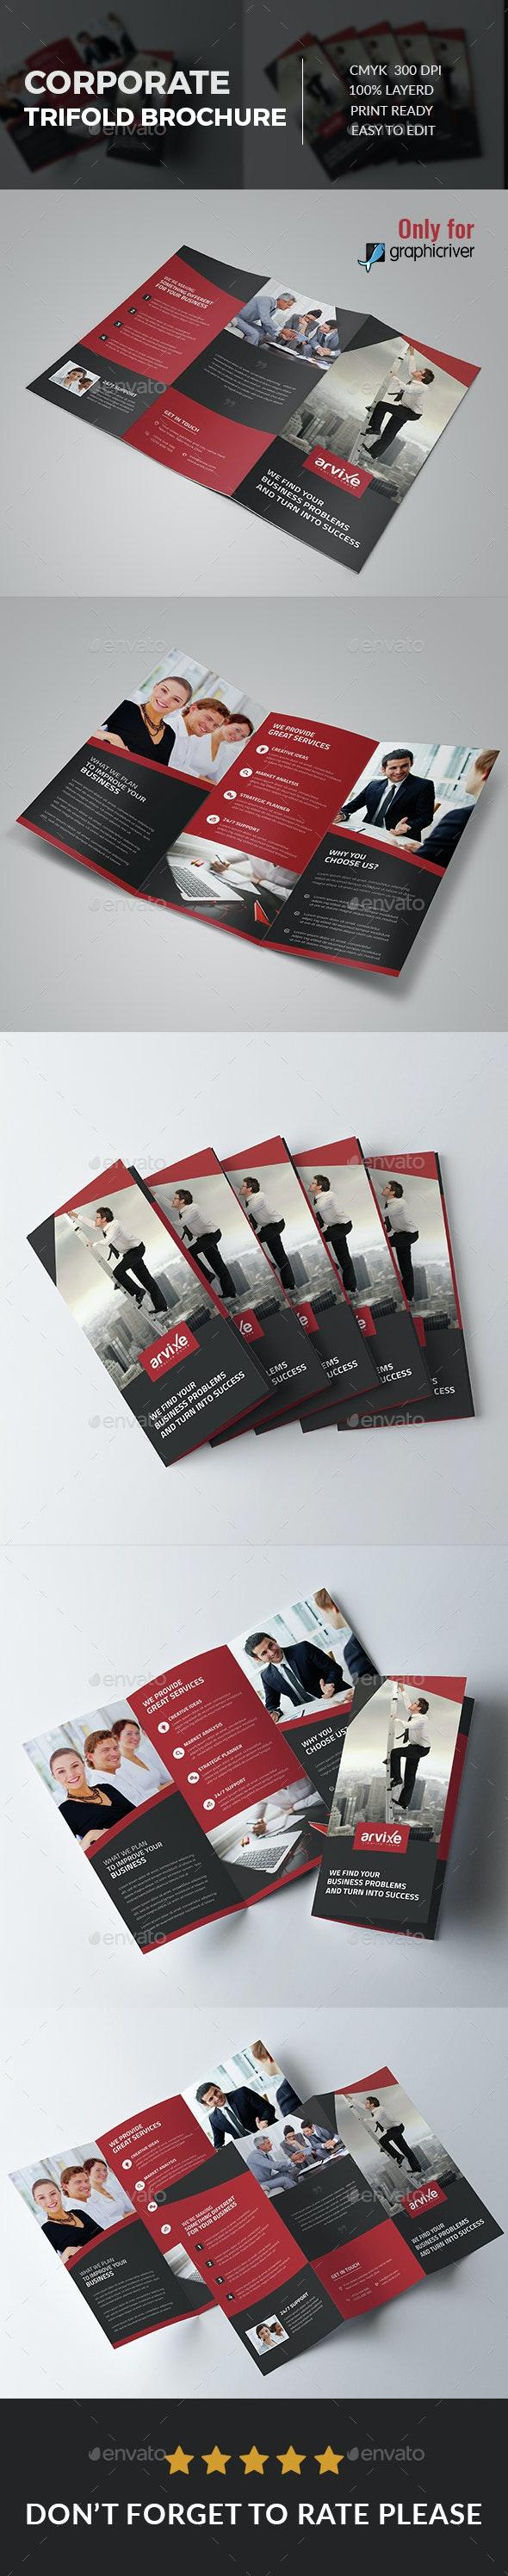 Corporate Tri fold Brochure - Brochures Print Templates